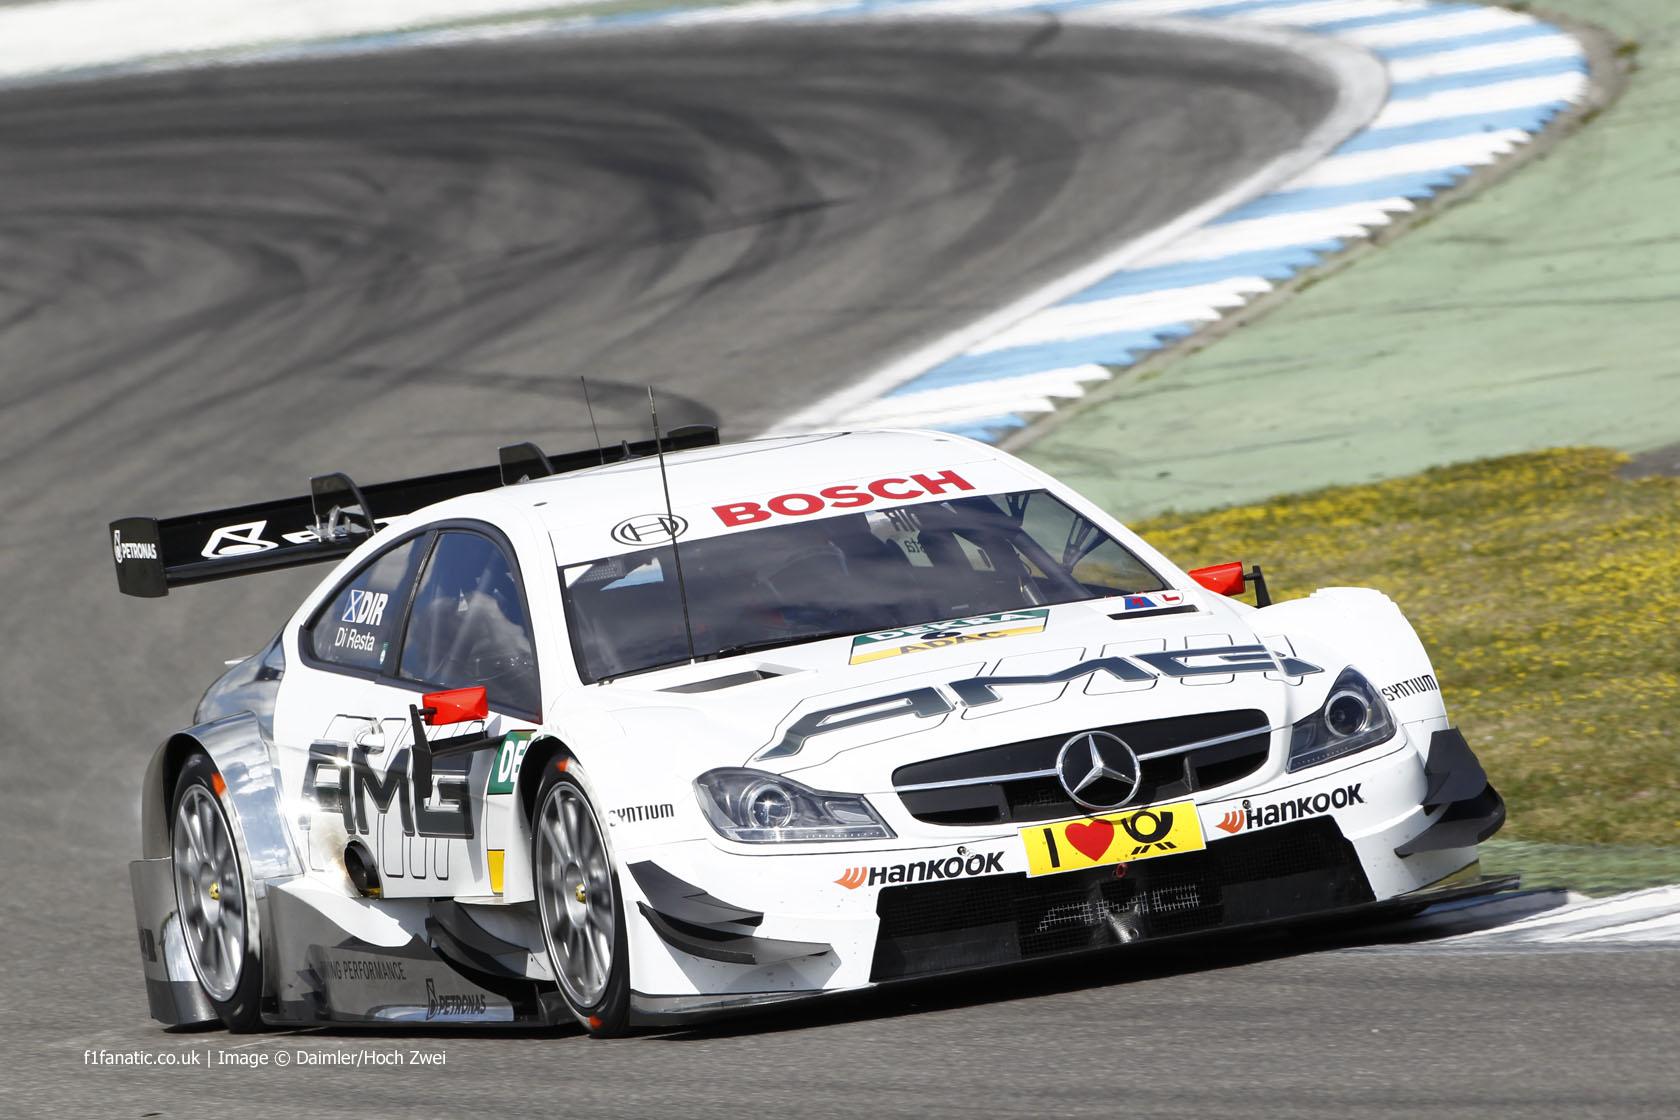 Paul di Resta, Mercedes C-Coupe AMG DTM, 2014